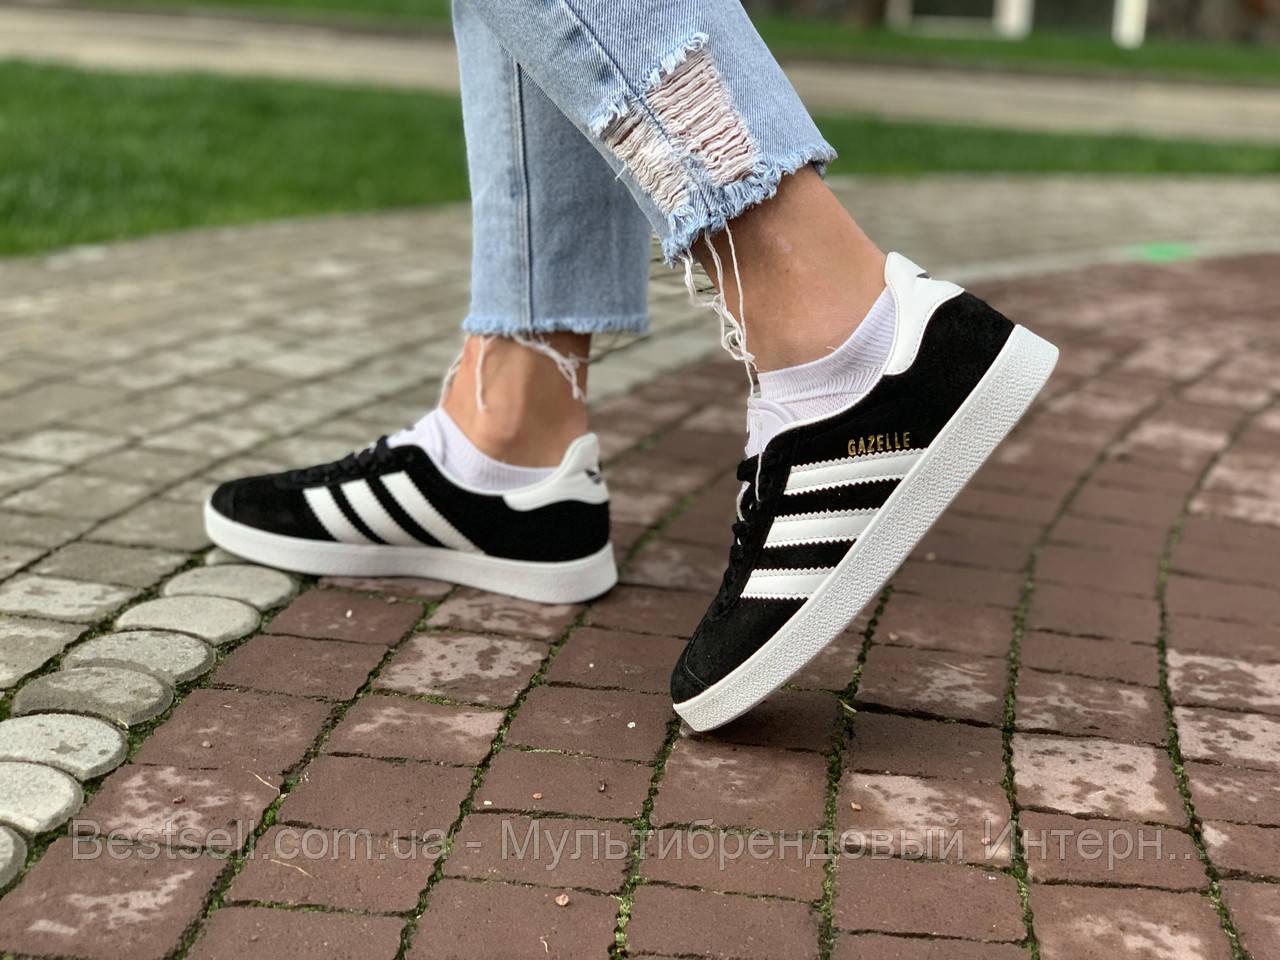 Кроссовки натуральная замша Adidas Gazelle Адидас Газель  (36,37,38,41)